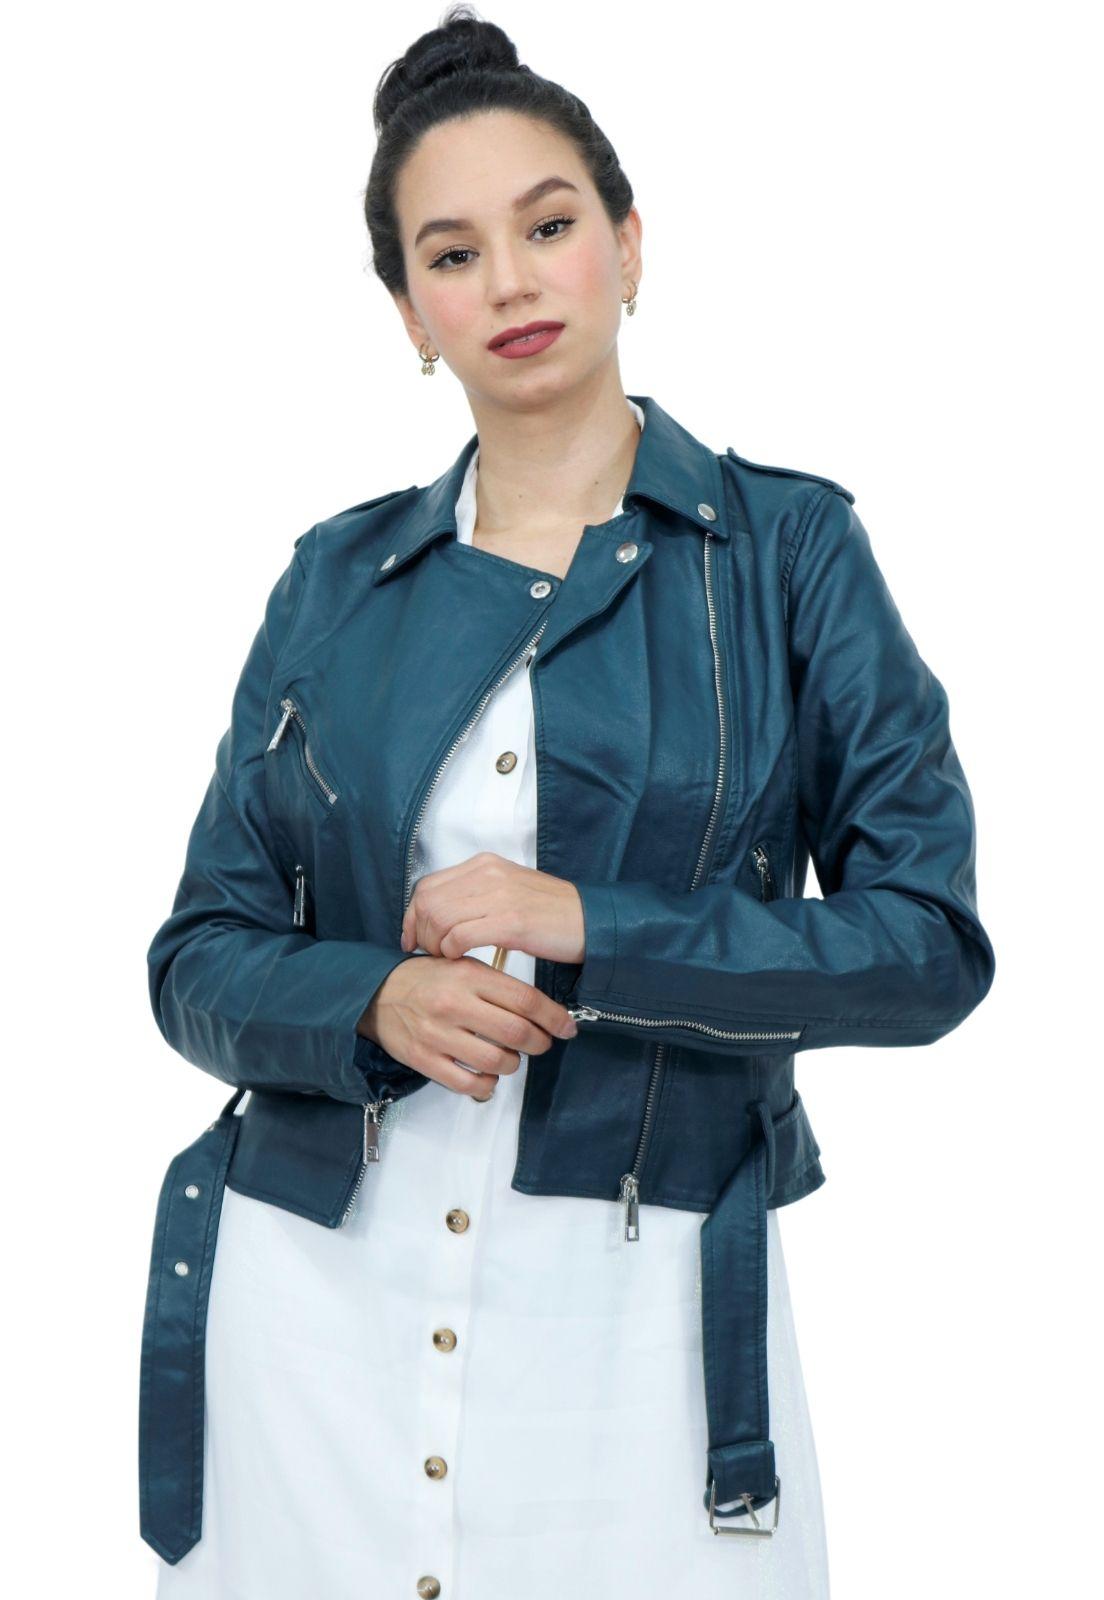 Jaqueta Feminina Material Sintético PU